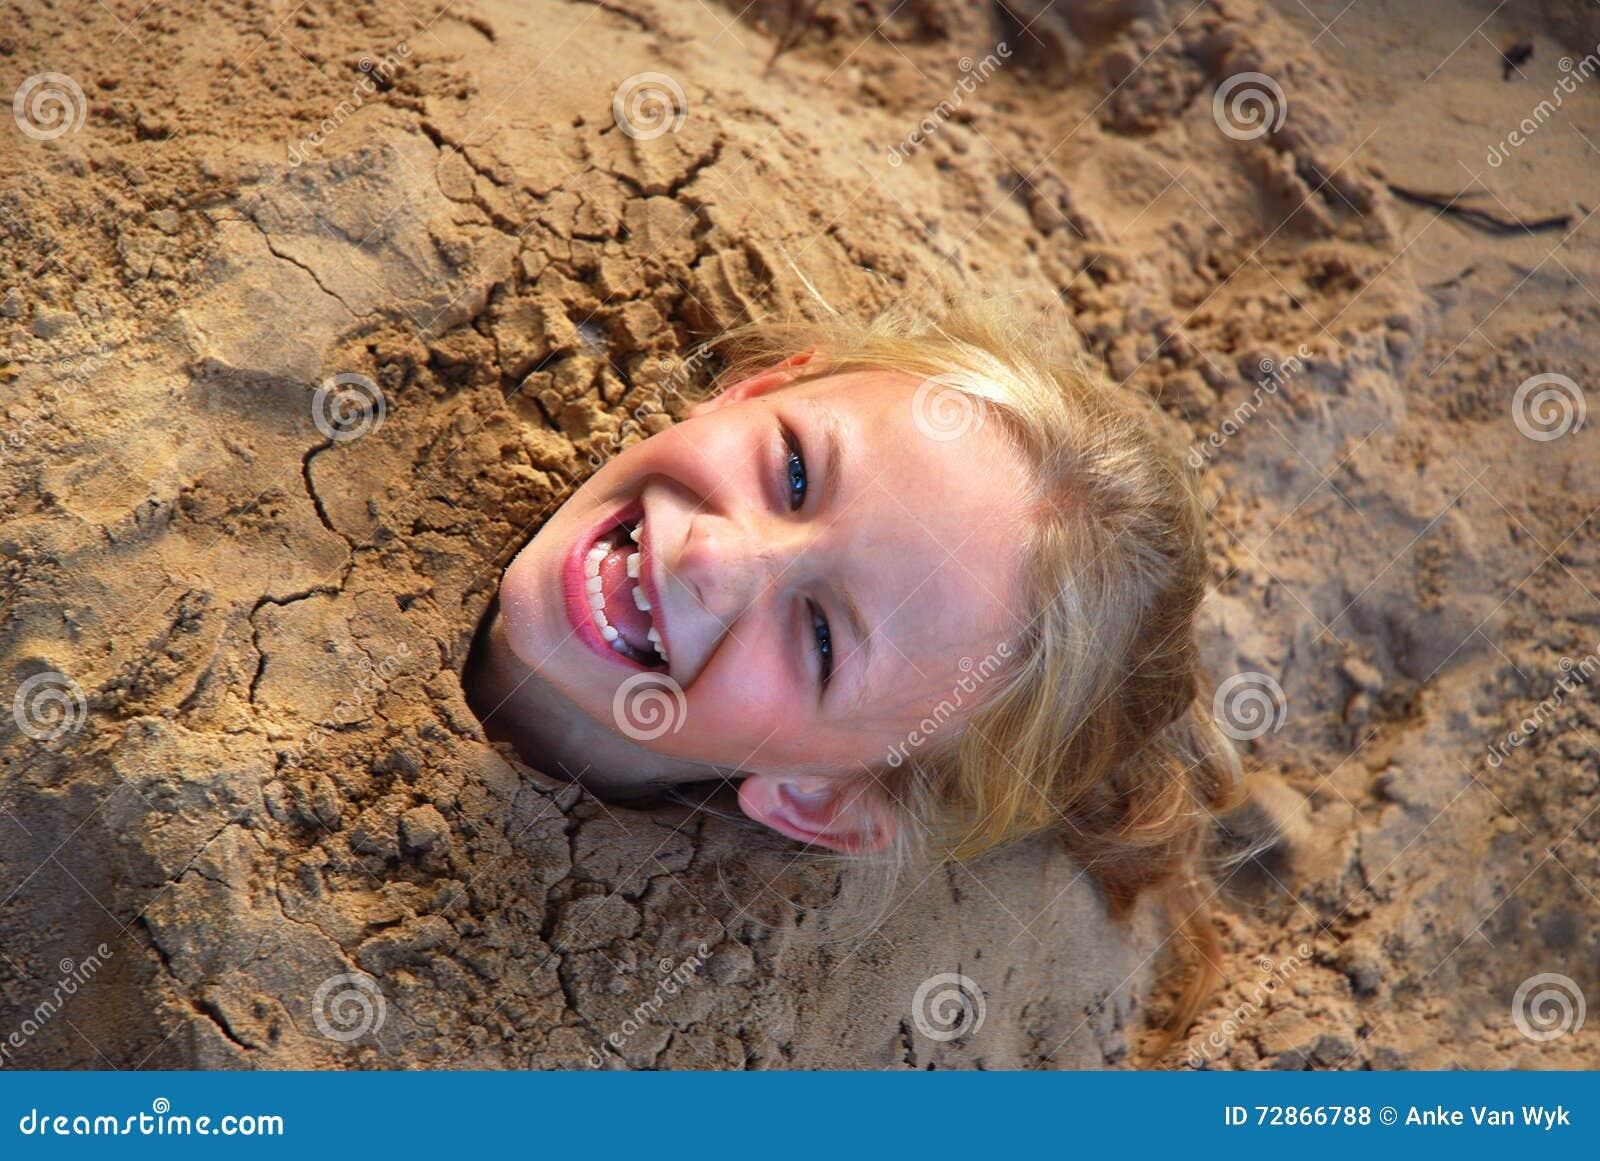 Little girl dug into sand